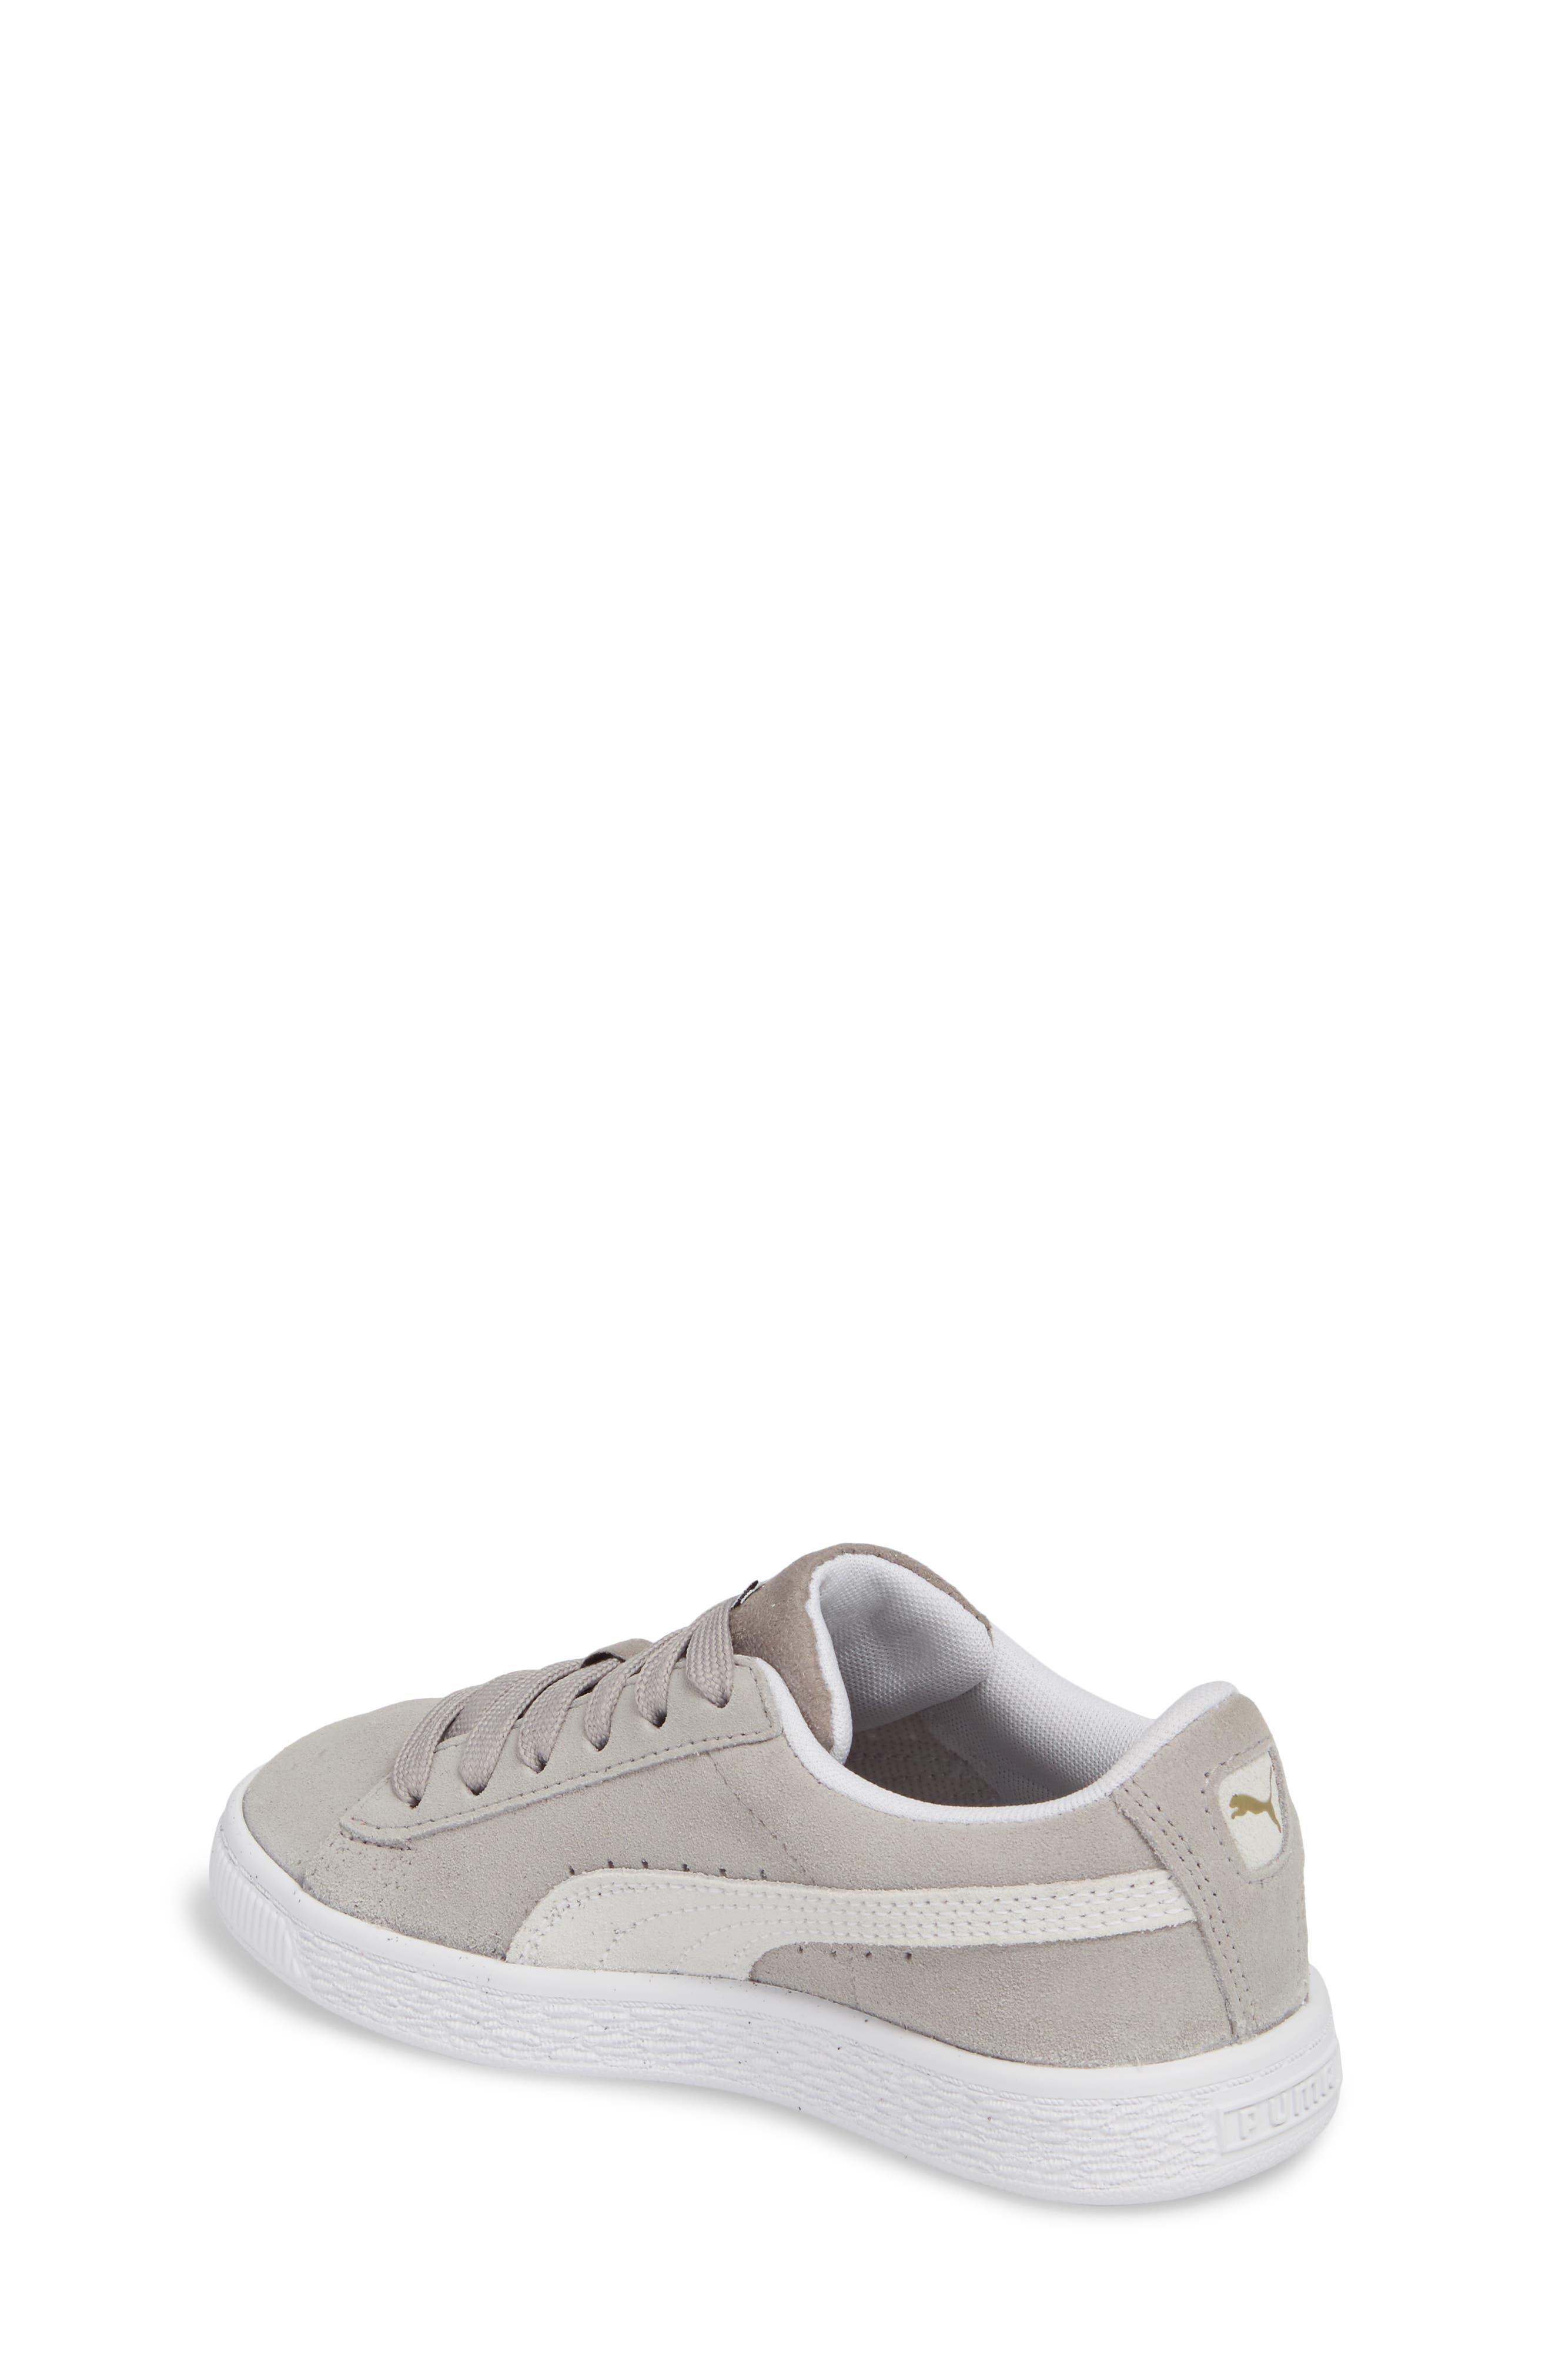 Suede Sneaker,                             Alternate thumbnail 2, color,                             Ash/ Puma White